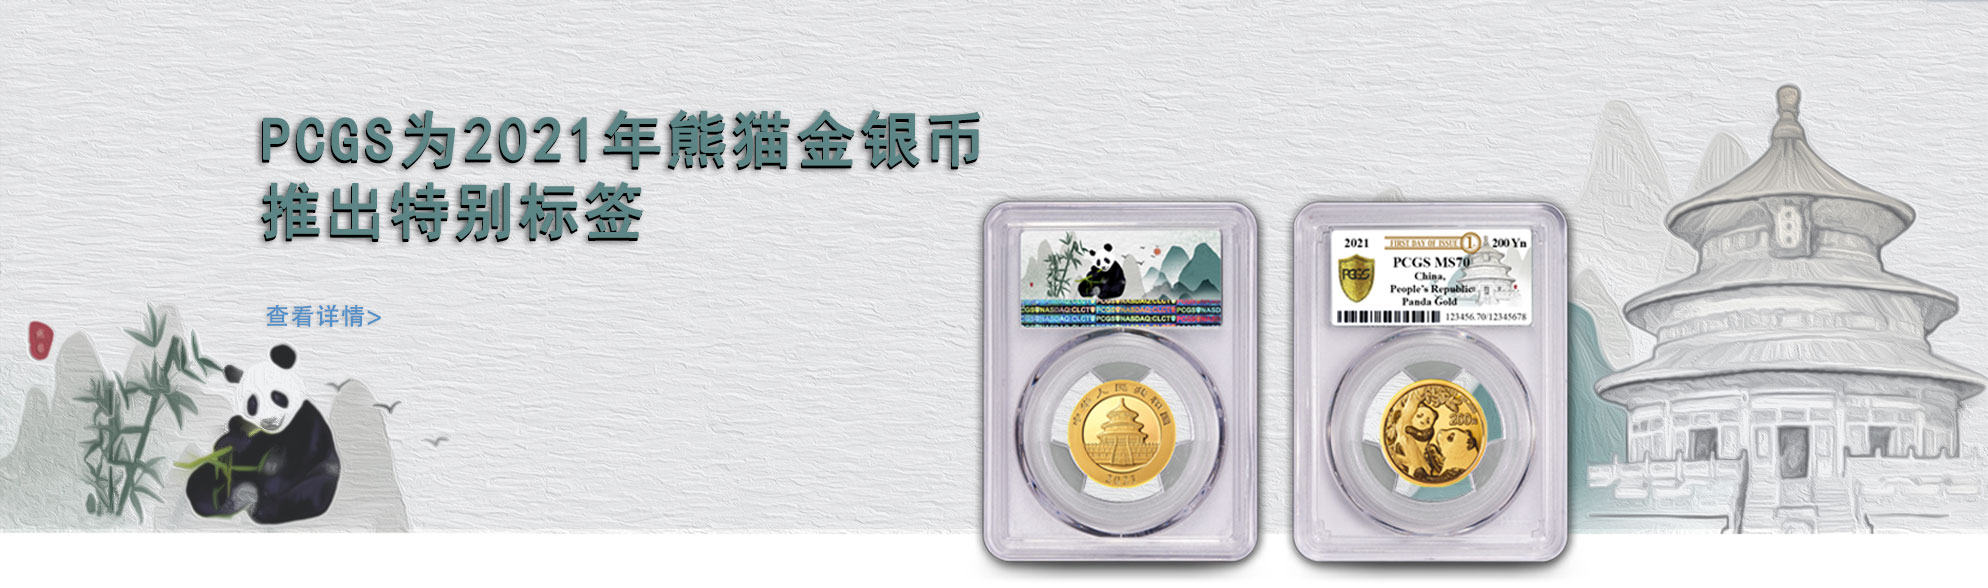 PCGS为2021年熊猫金银币推出特别标签